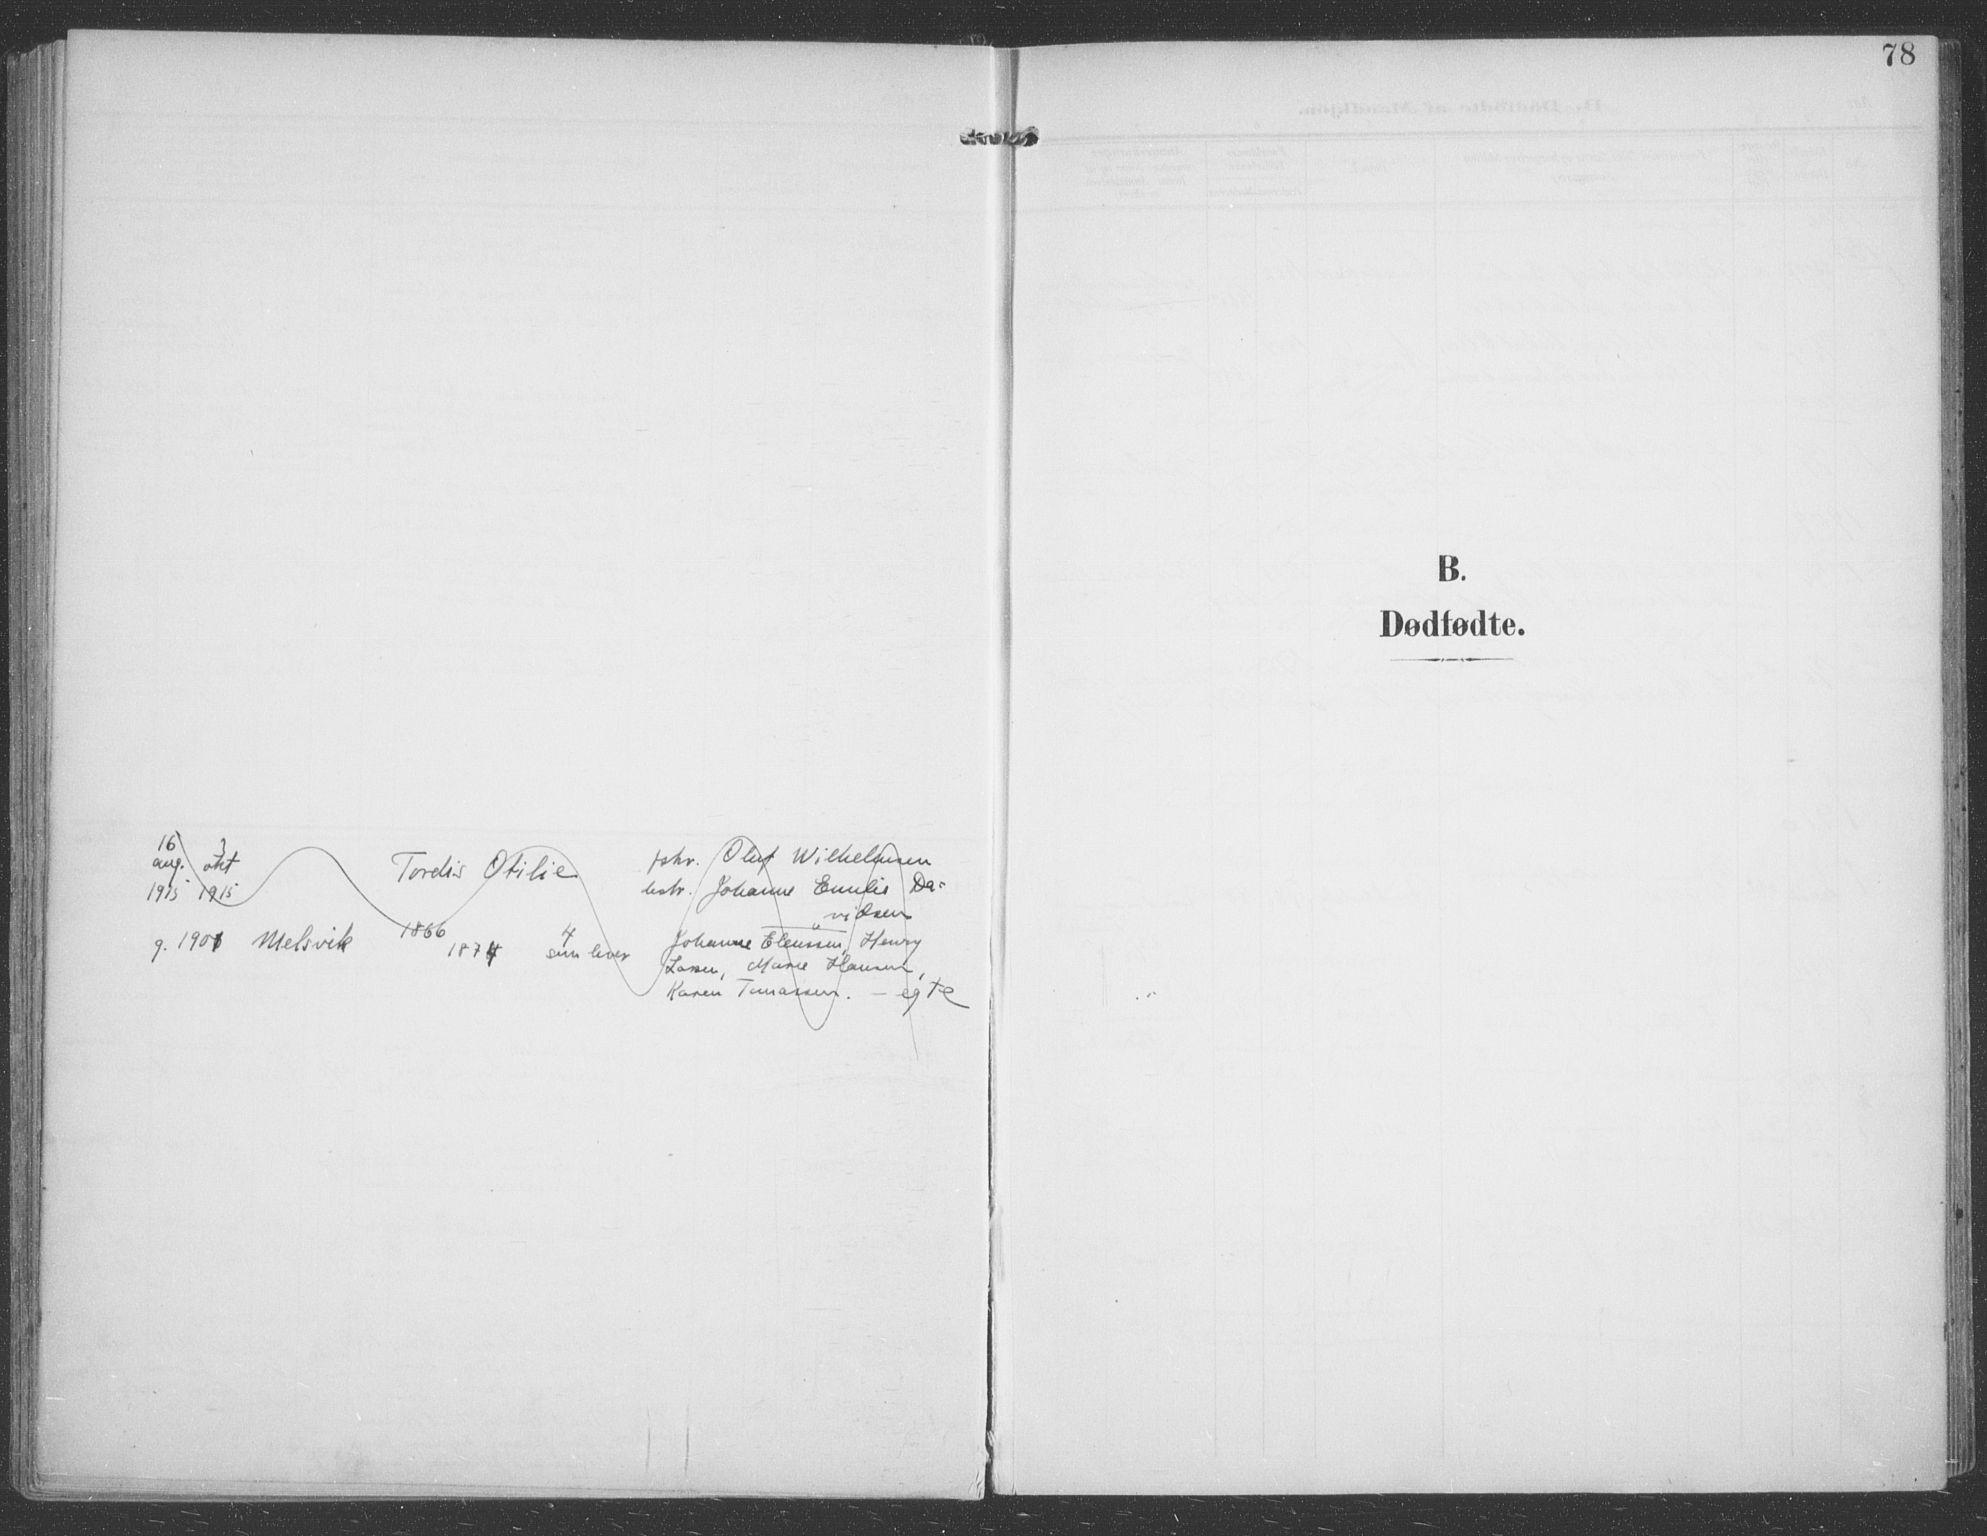 SATØ, Talvik sokneprestkontor, H/Ha/L0017kirke: Ministerialbok nr. 17, 1906-1915, s. 78